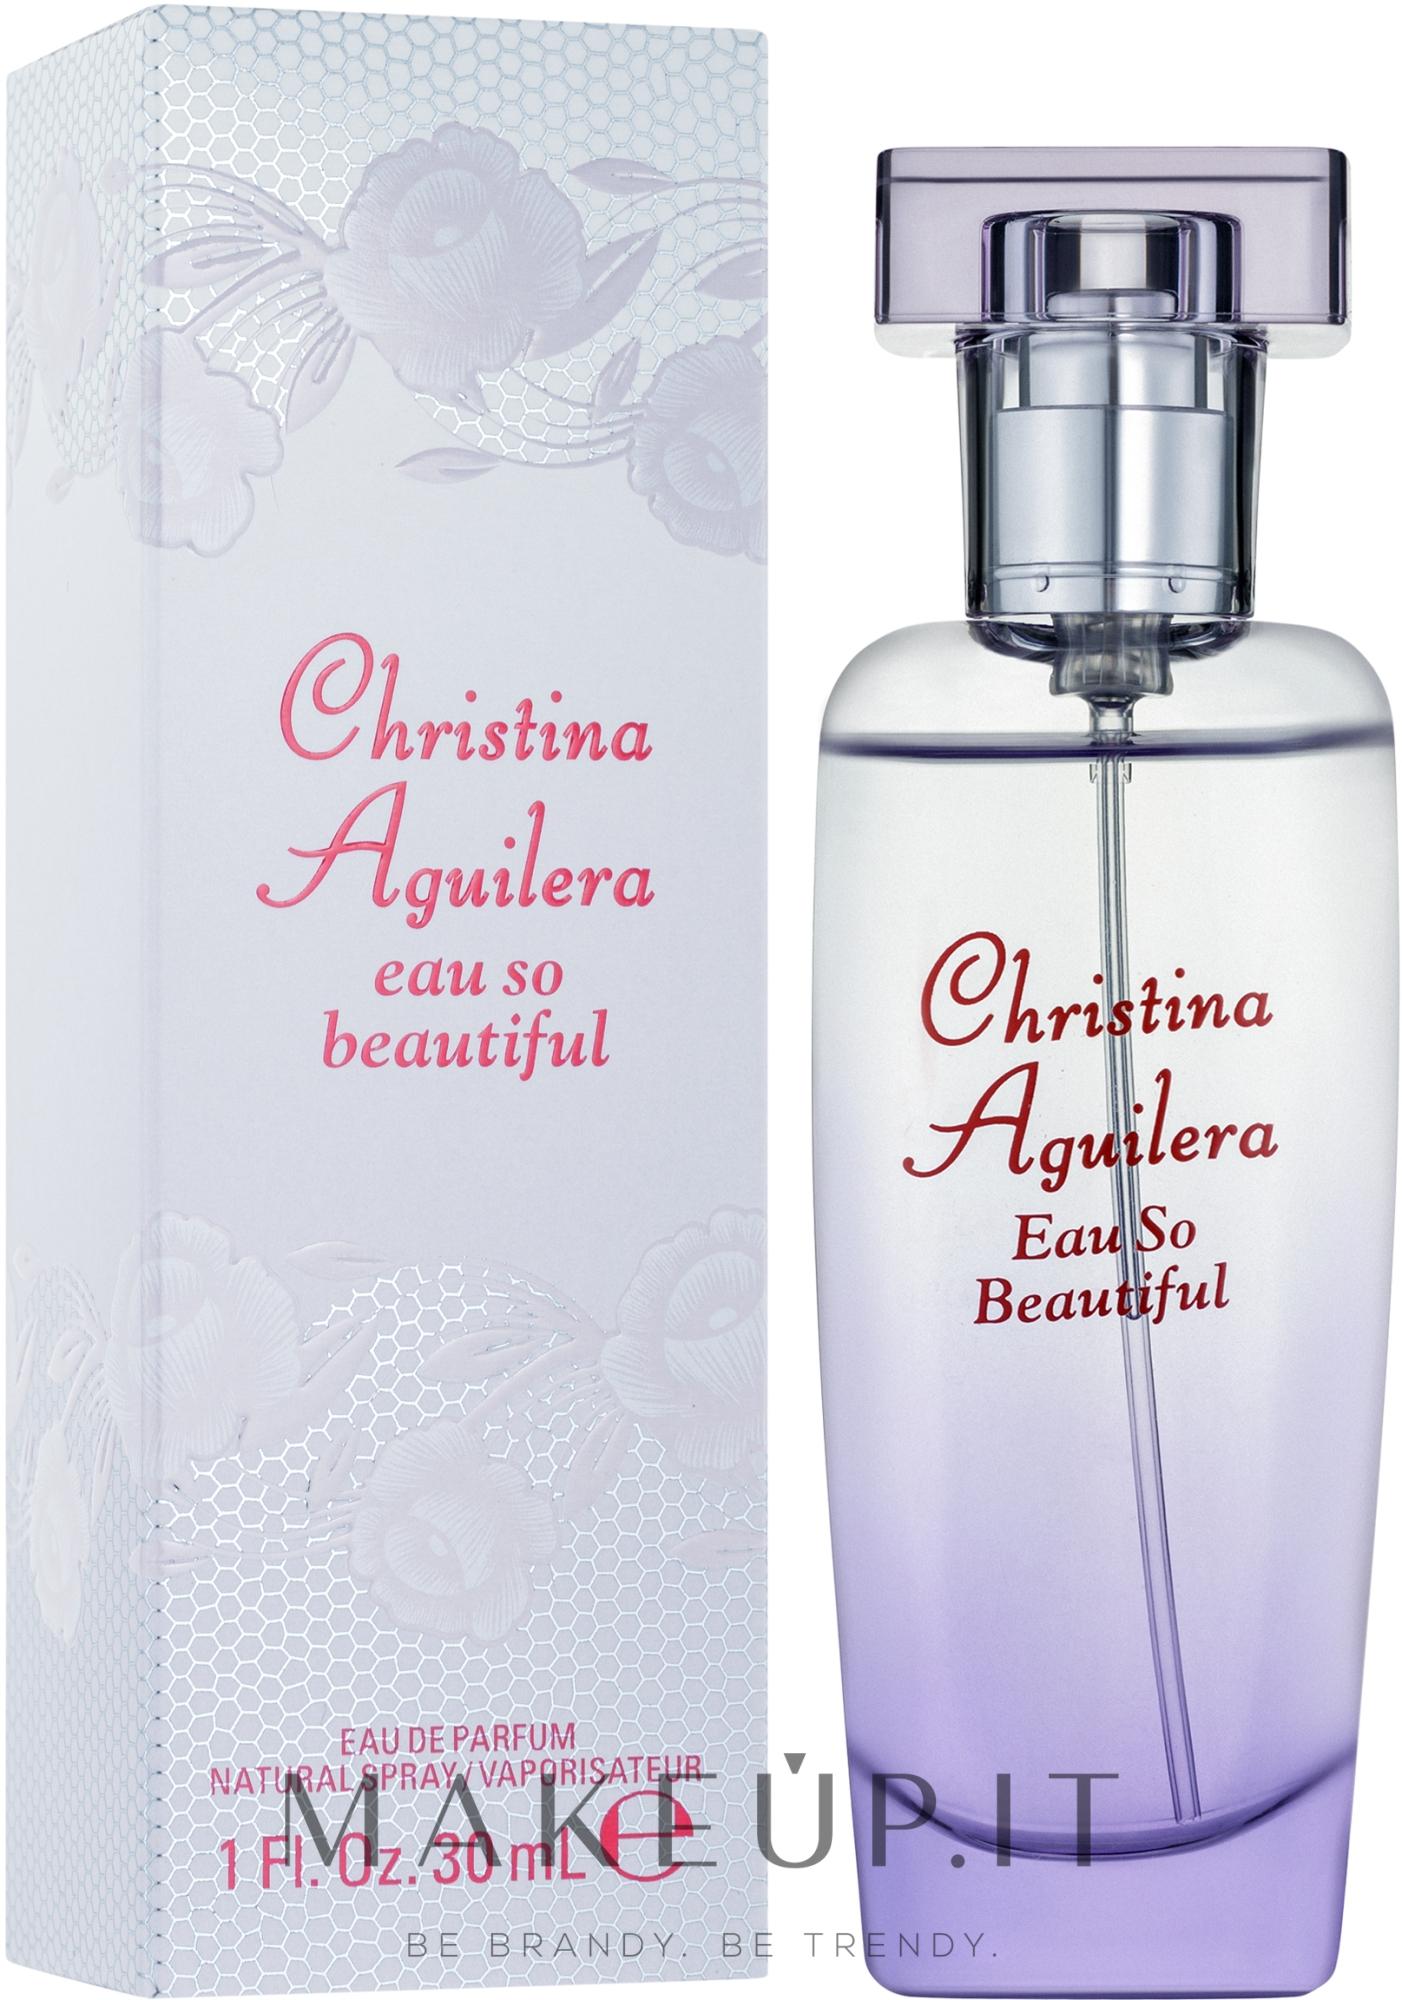 Christina Aguilera Eau So Beautiful - Eau de parfum — foto 30 ml